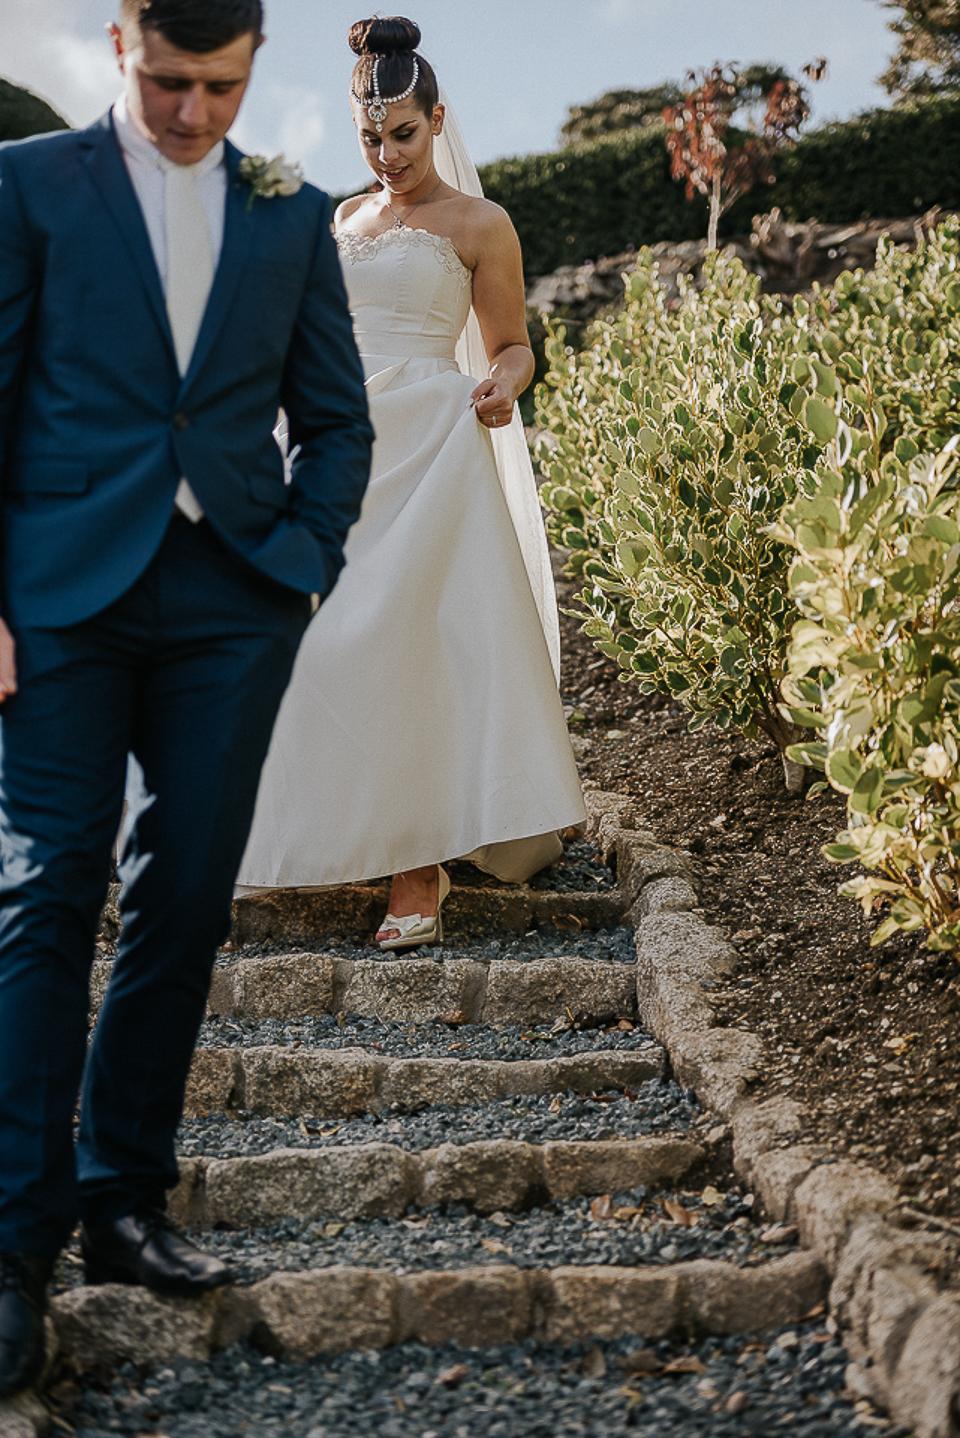 best-wedding-photographer-cornwall-2017-65.jpg